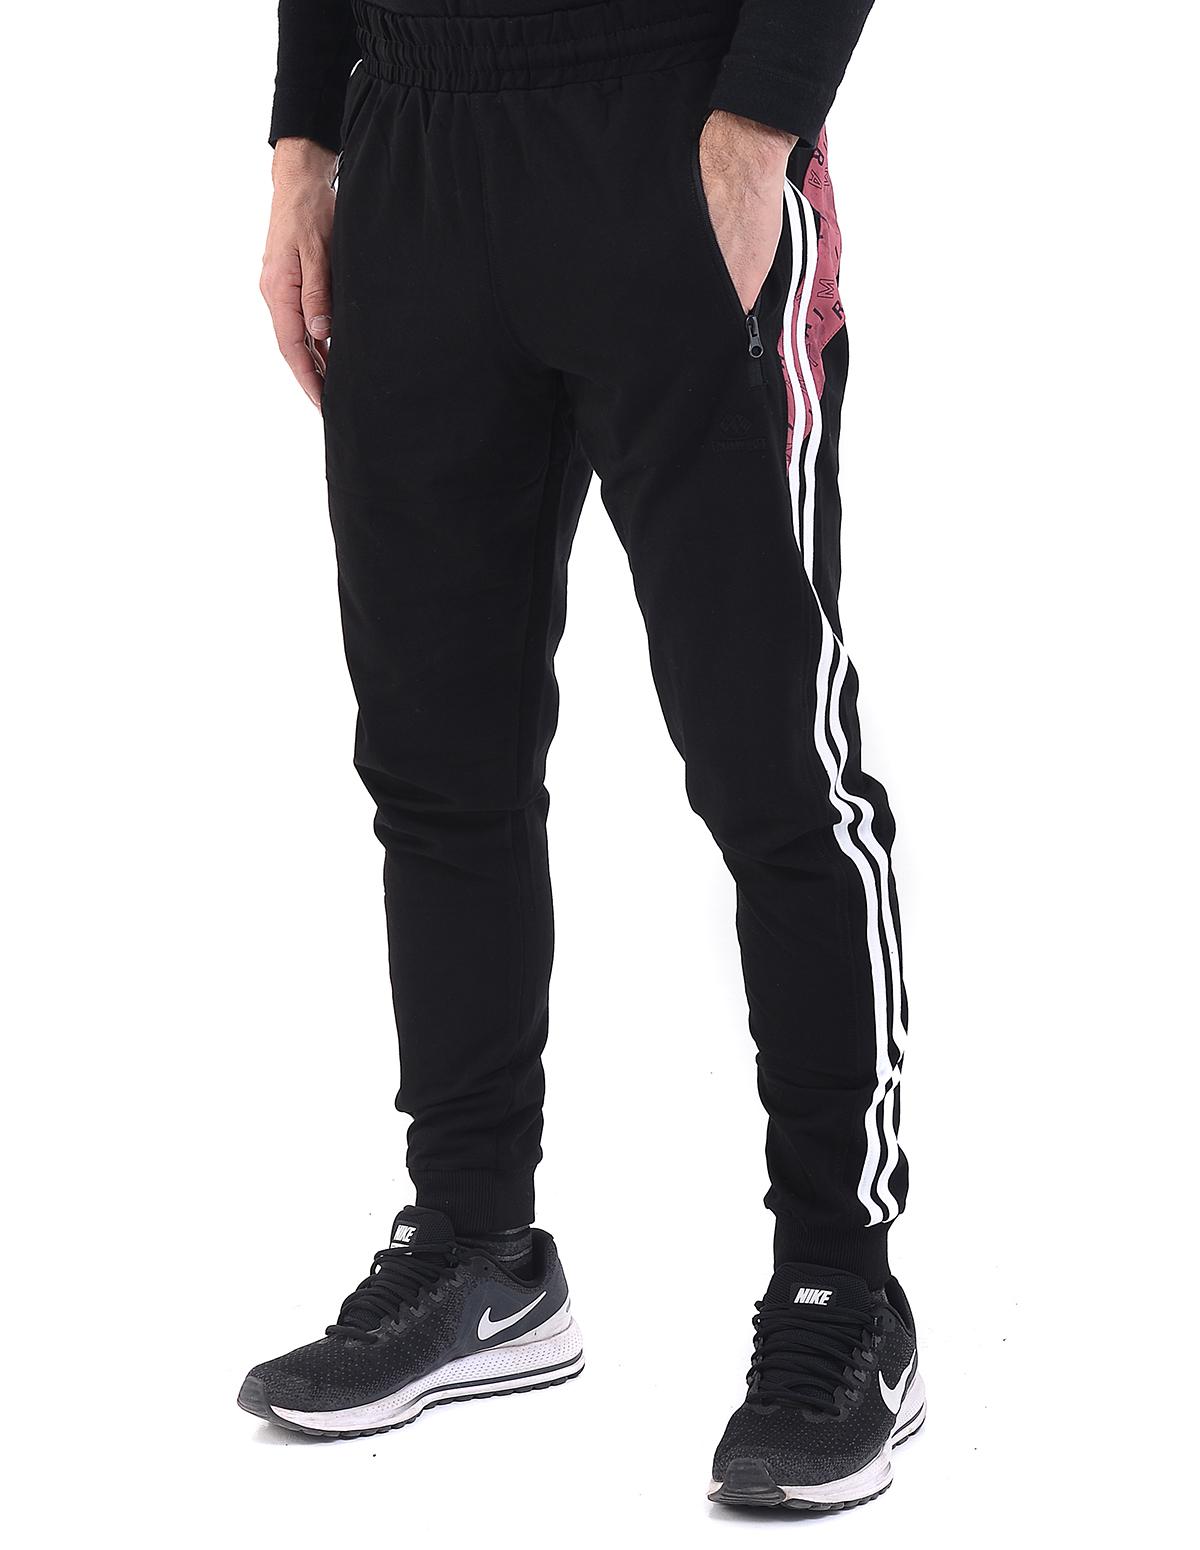 24a0005bd27 Vactive TLife Ανδρικό παντελόνι φόρμας jogger με λάστιχο στο πόδι σε μαύρο  χρώμα και λευκή ρίγα